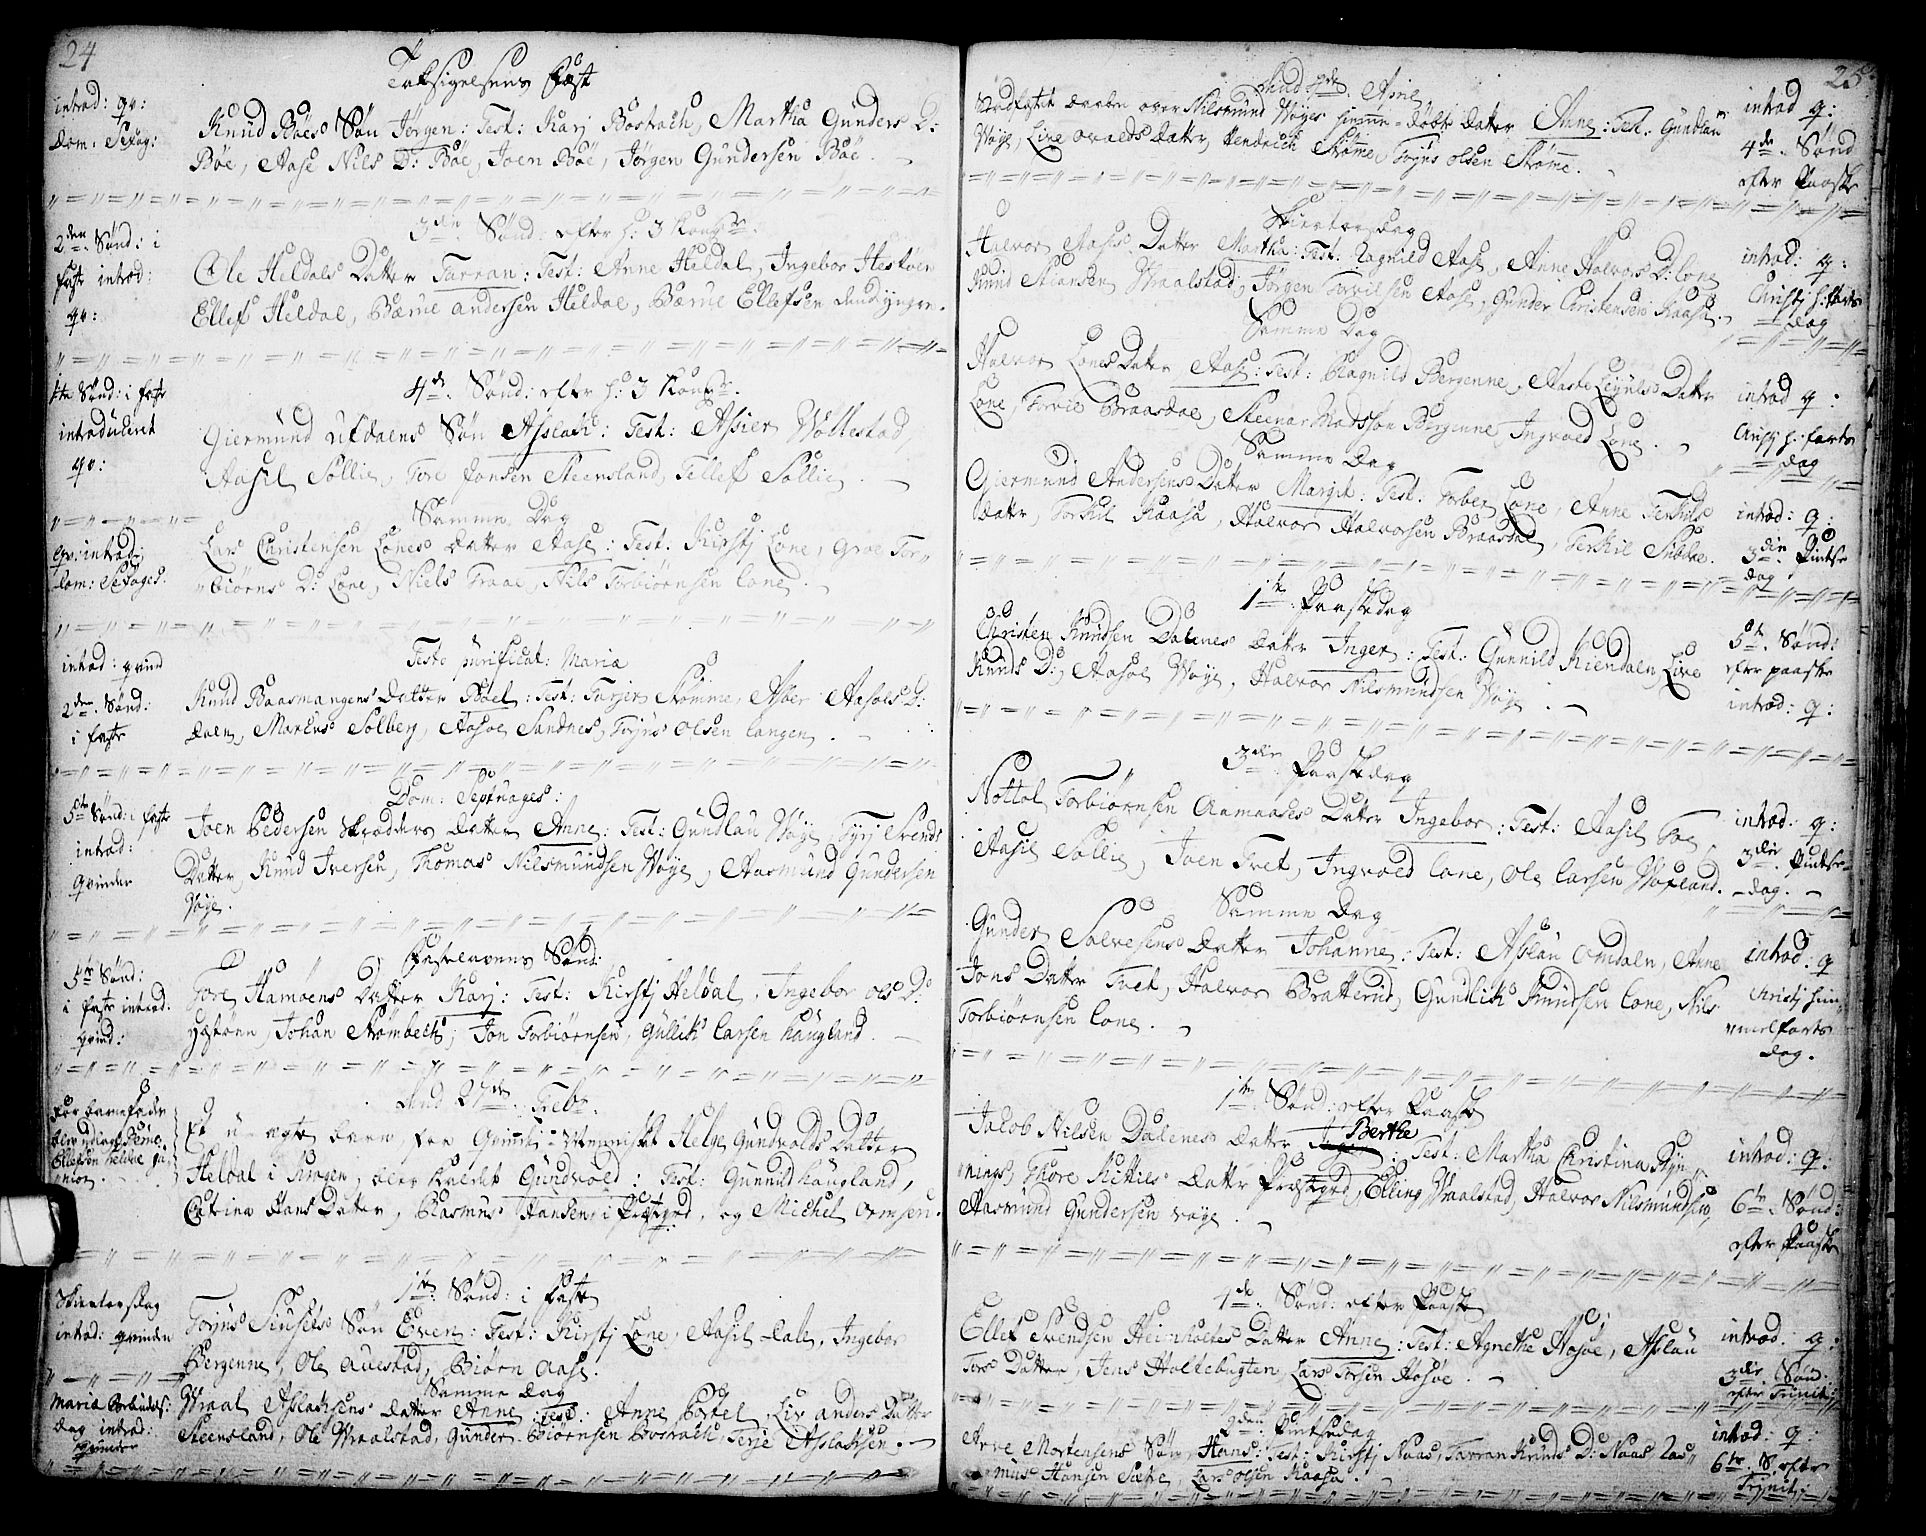 SAKO, Drangedal kirkebøker, F/Fa/L0001: Ministerialbok nr. 1, 1697-1767, s. 24-25